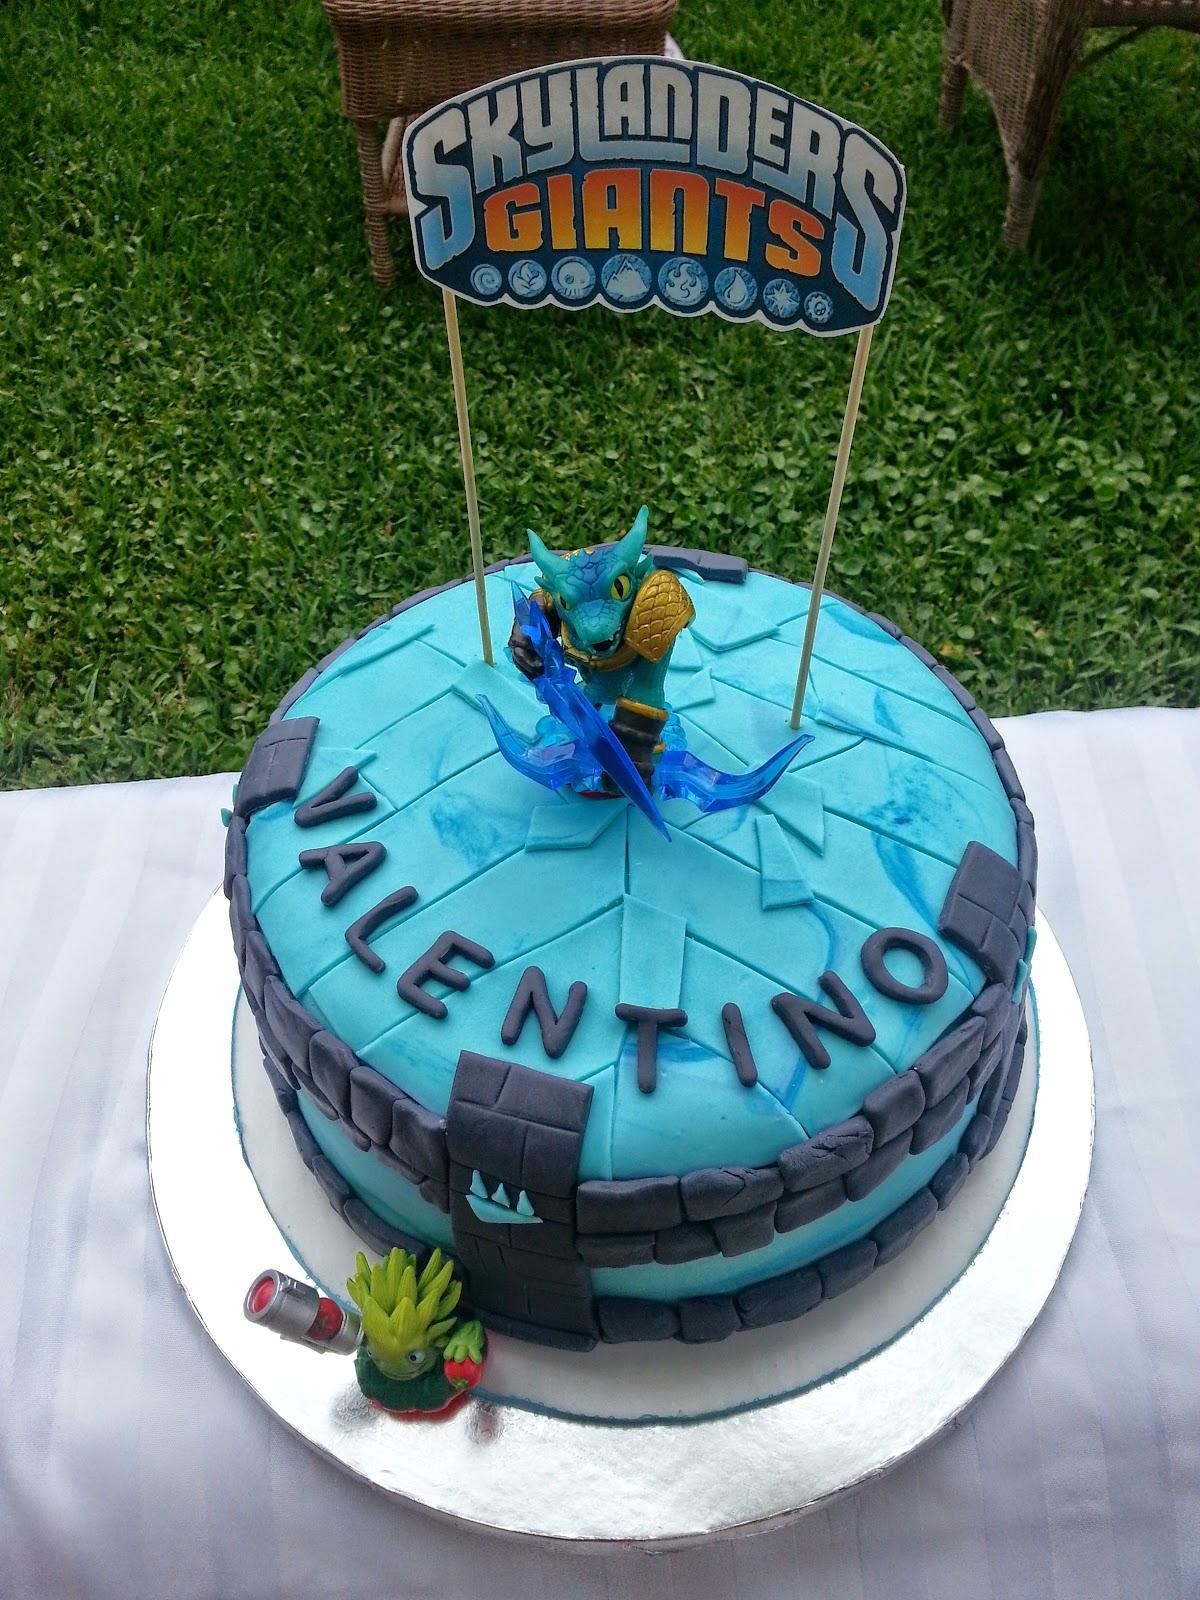 Nanas Theme Party SkyLanders GiantsBirthday Cake